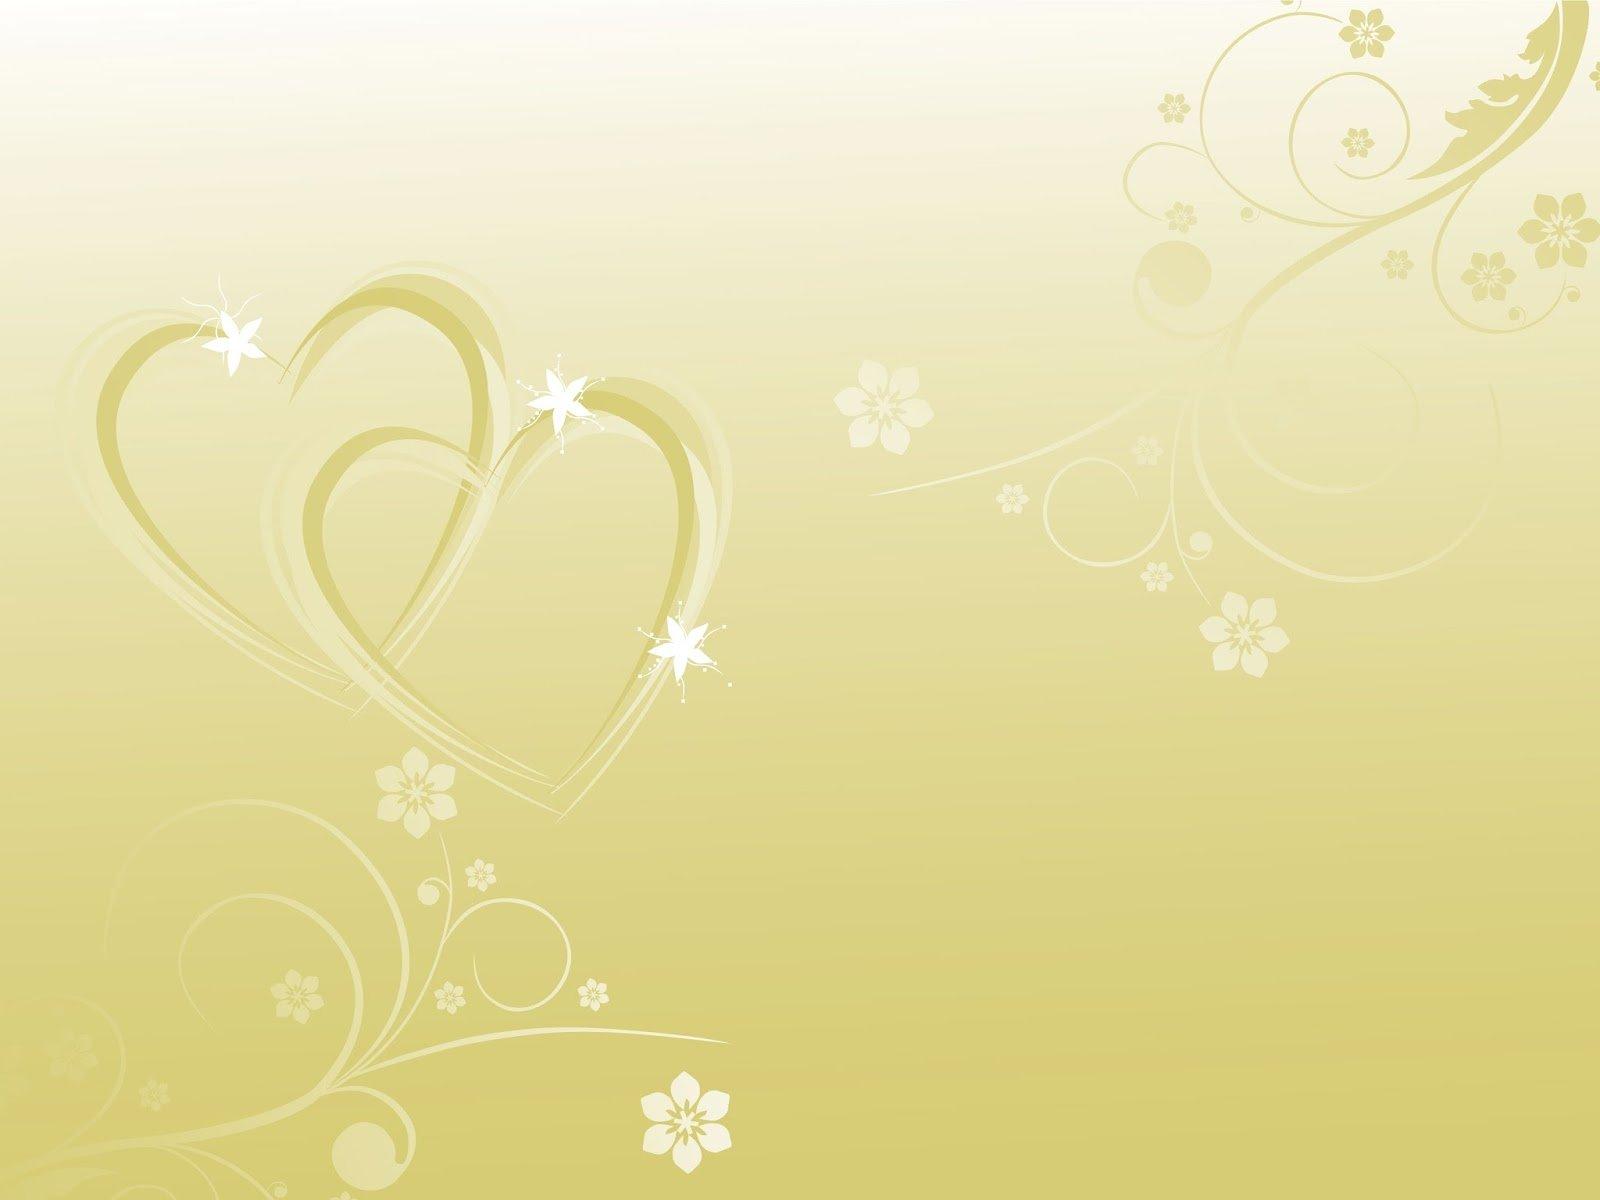 cute Wallpaper Related To Love : cute Hearts Background - WallpaperSafari